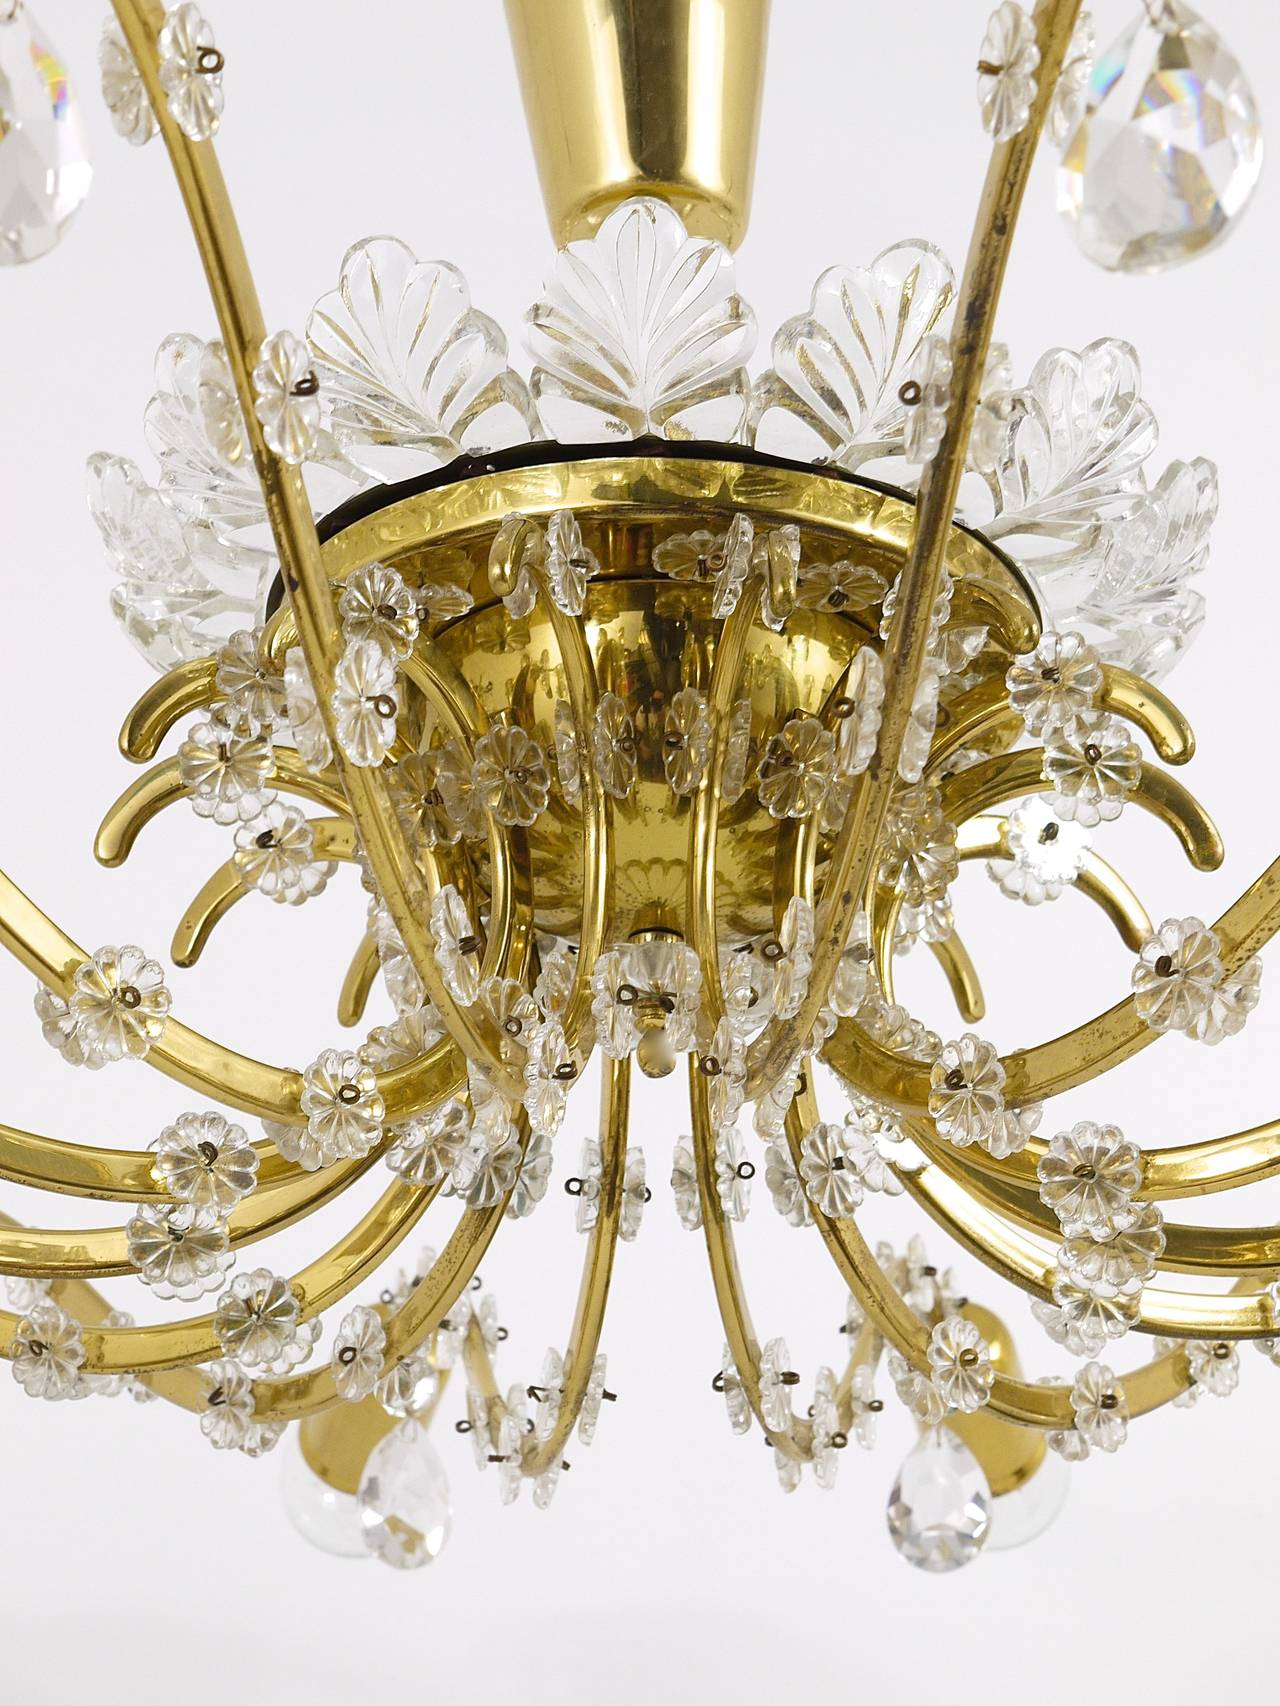 Huge Floral Lobmeyr Mid-Century Brass Crystal Chandelier, 1950s, Austria For Sale 3